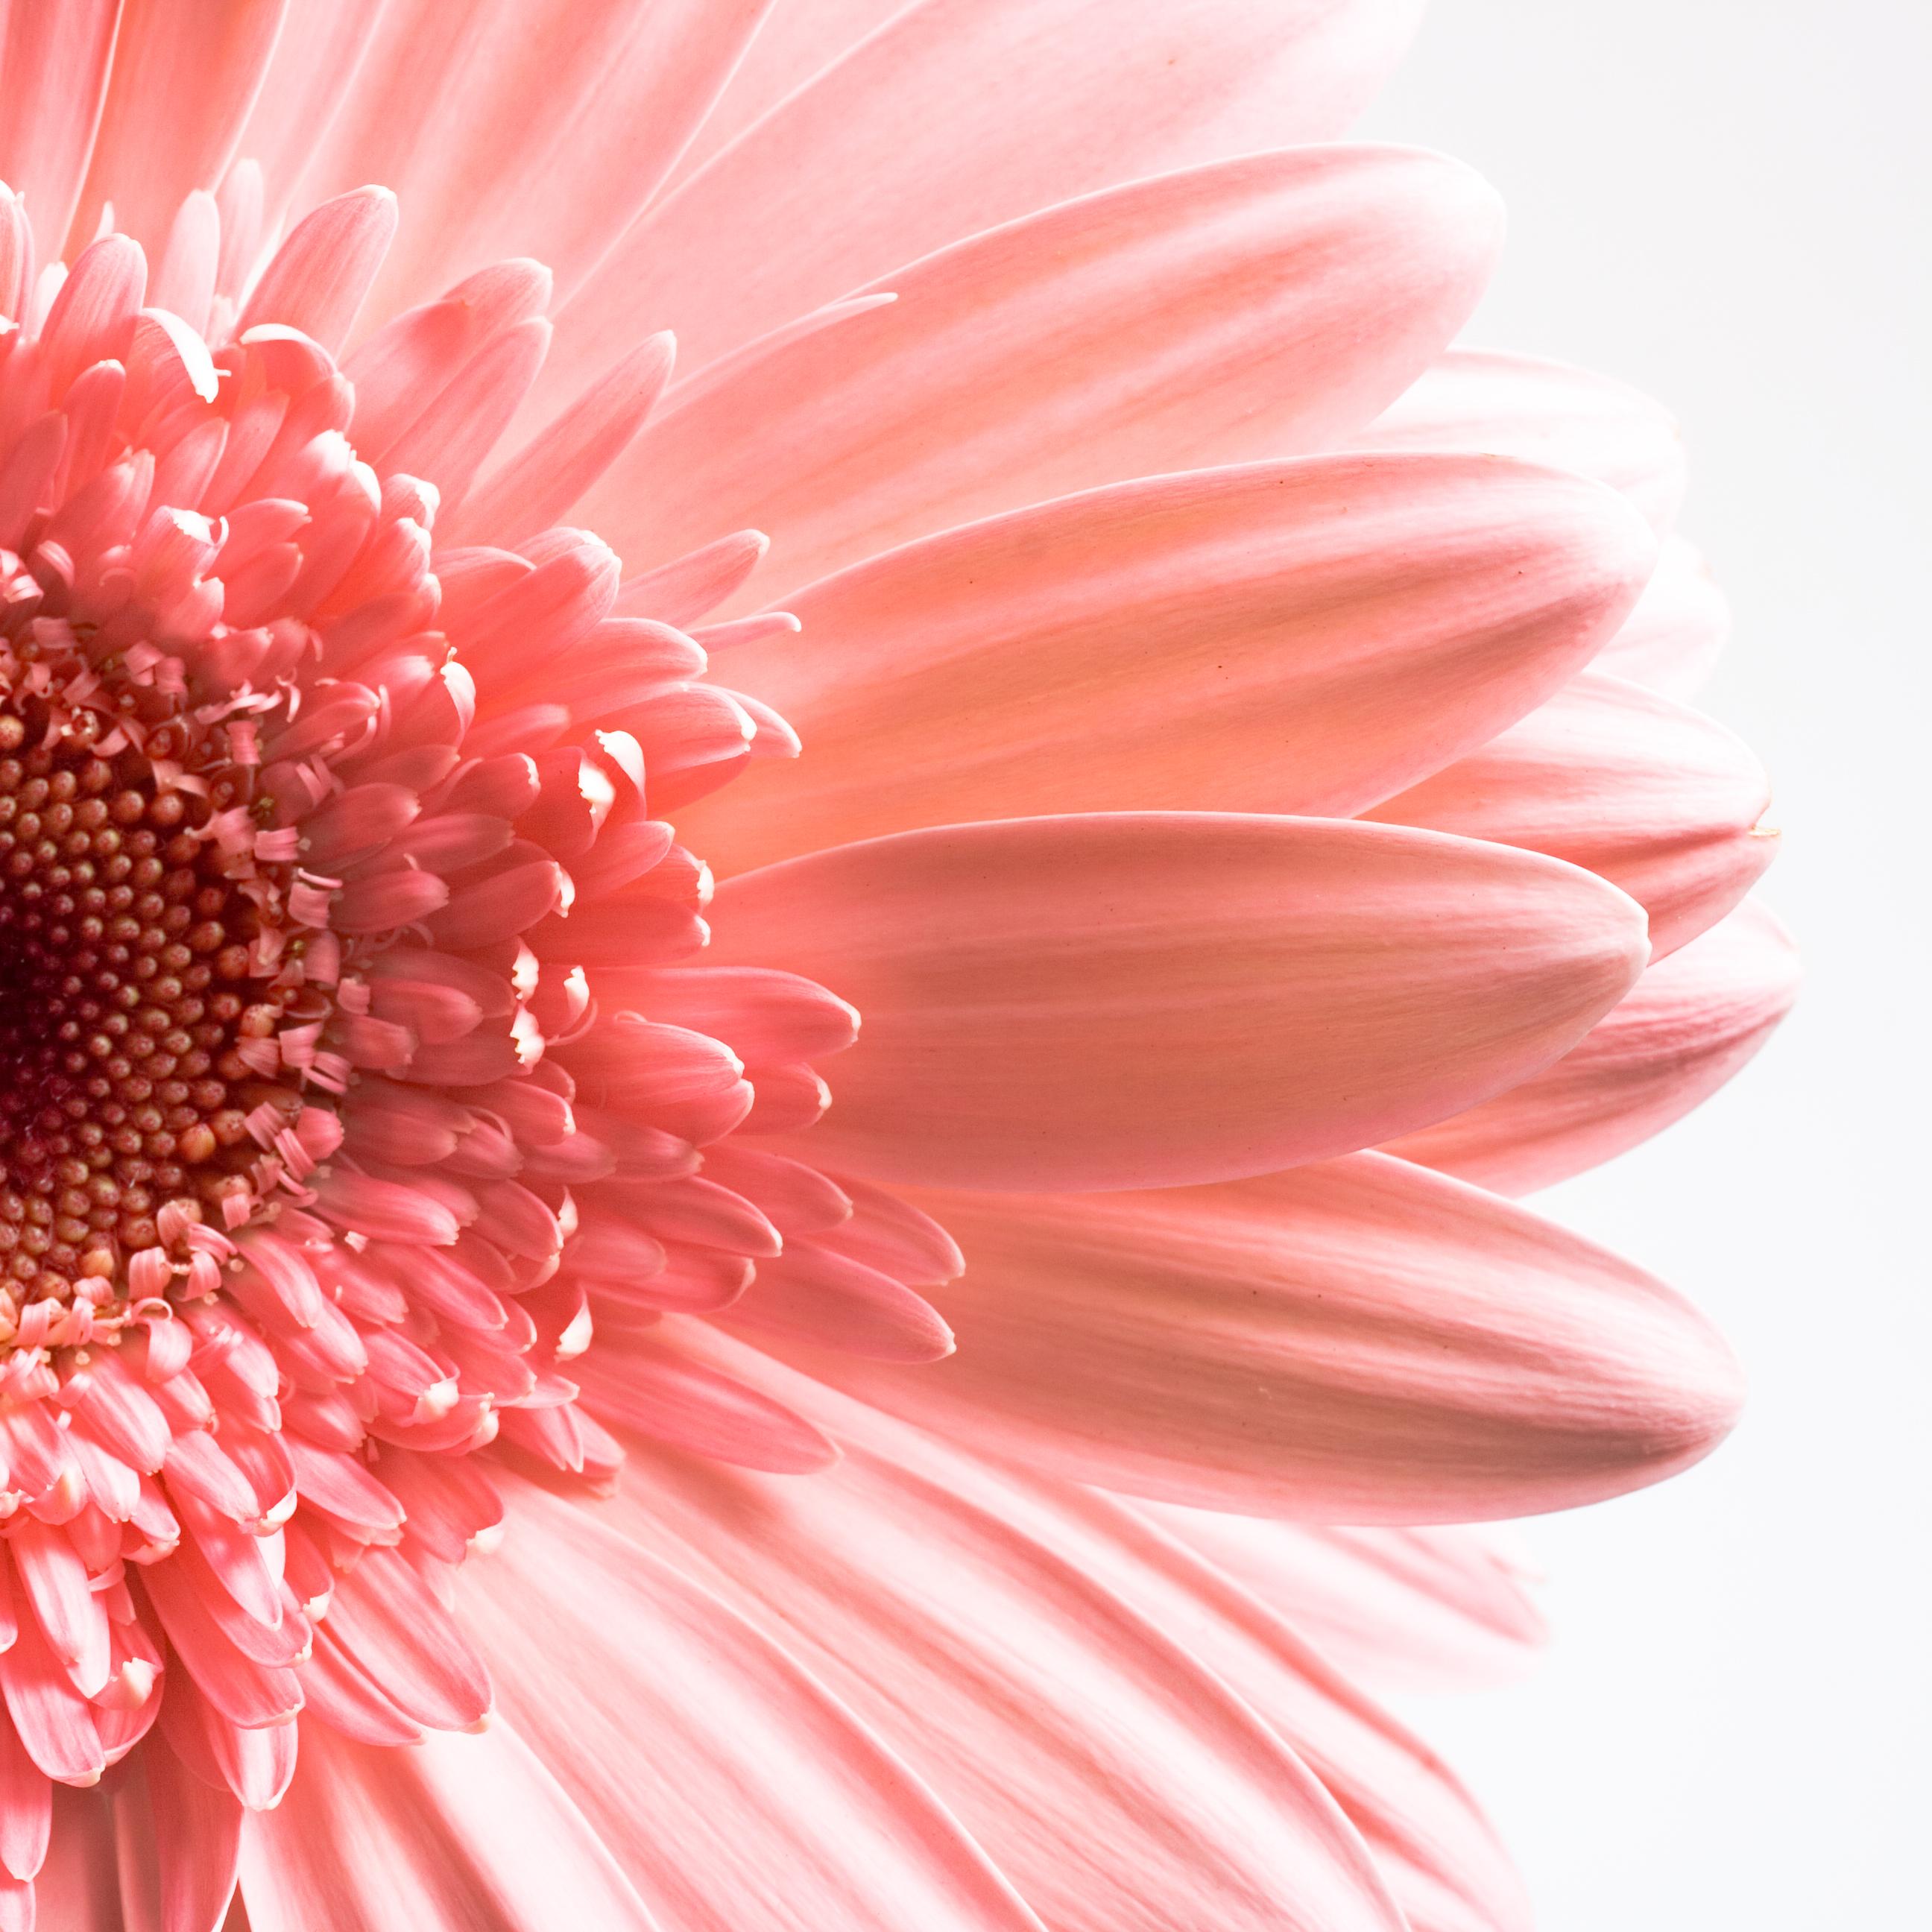 Gerbera Flower, One, Head, Isolated, Macro, HQ Photo